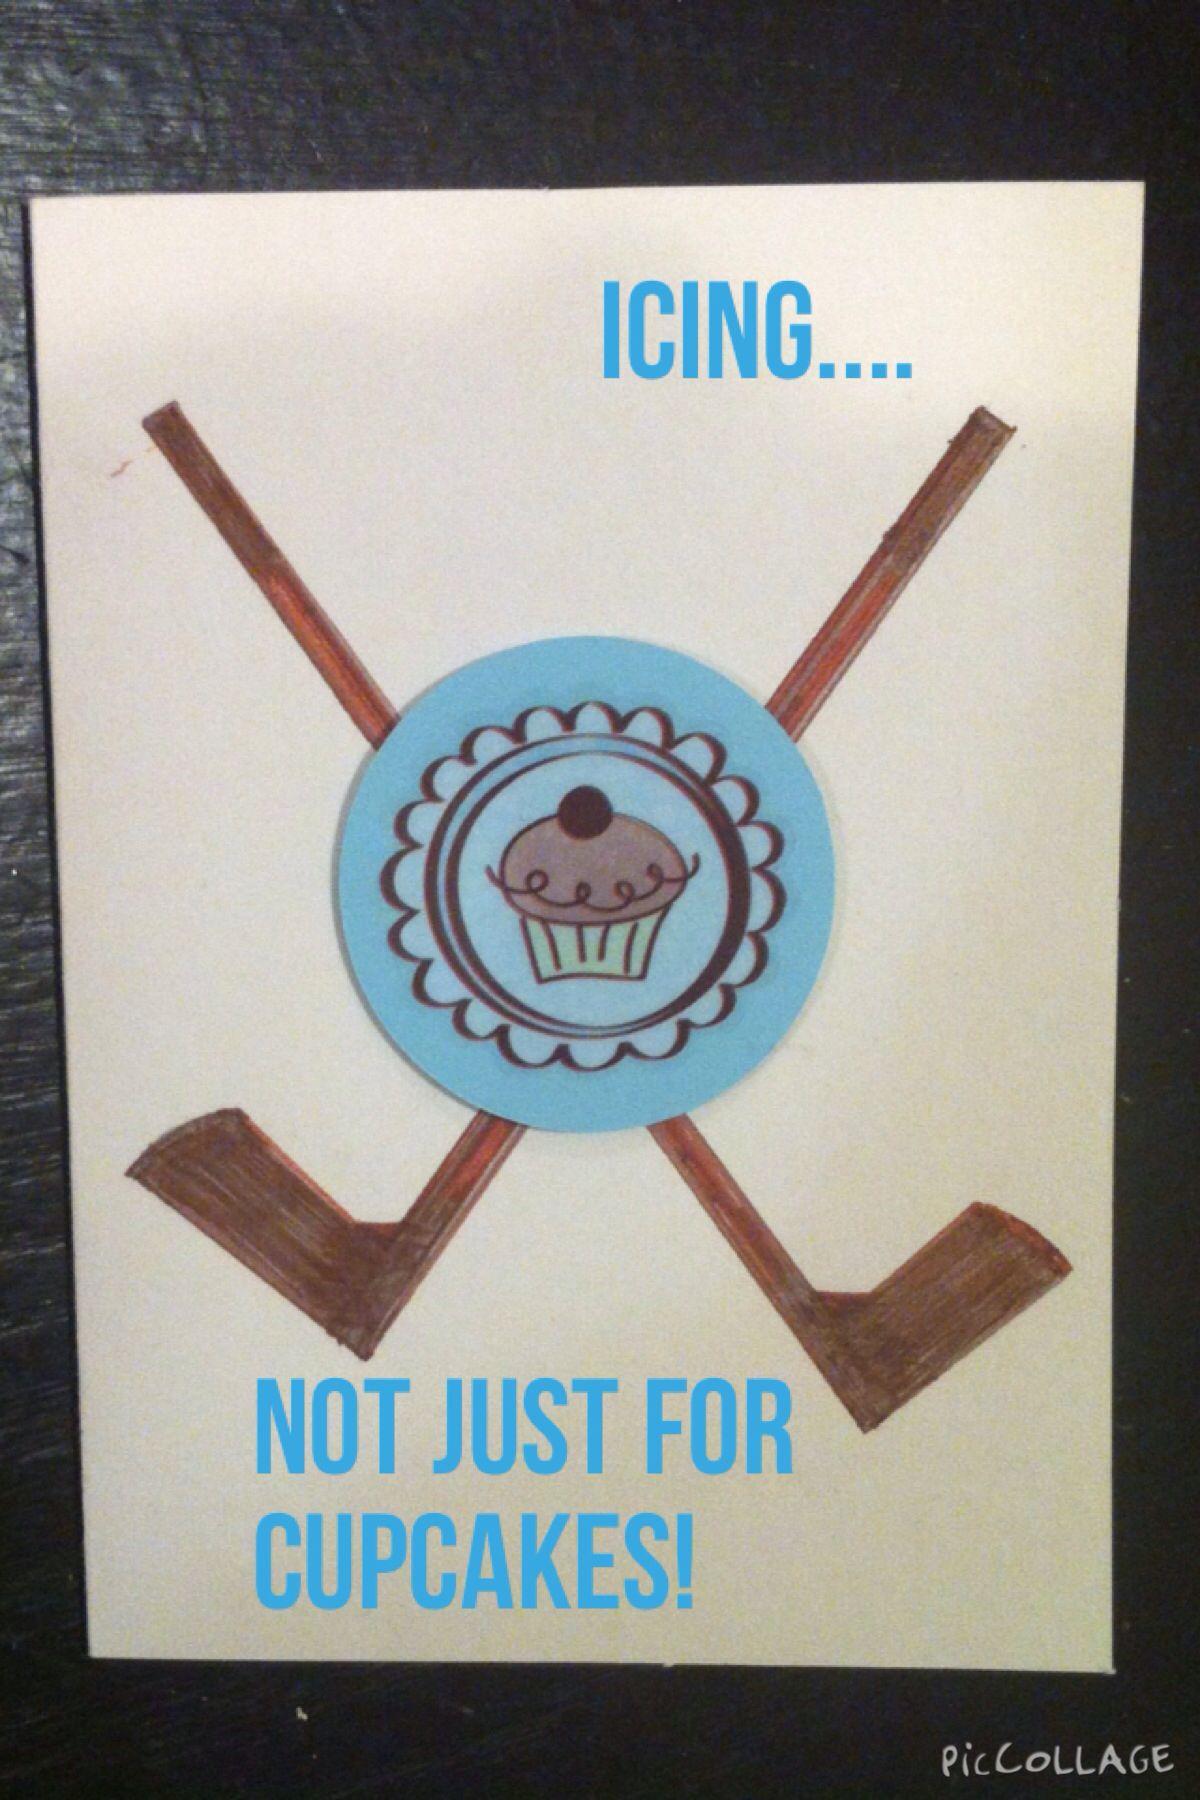 Homemade birthday card for my hockey fan man! Wrote icing